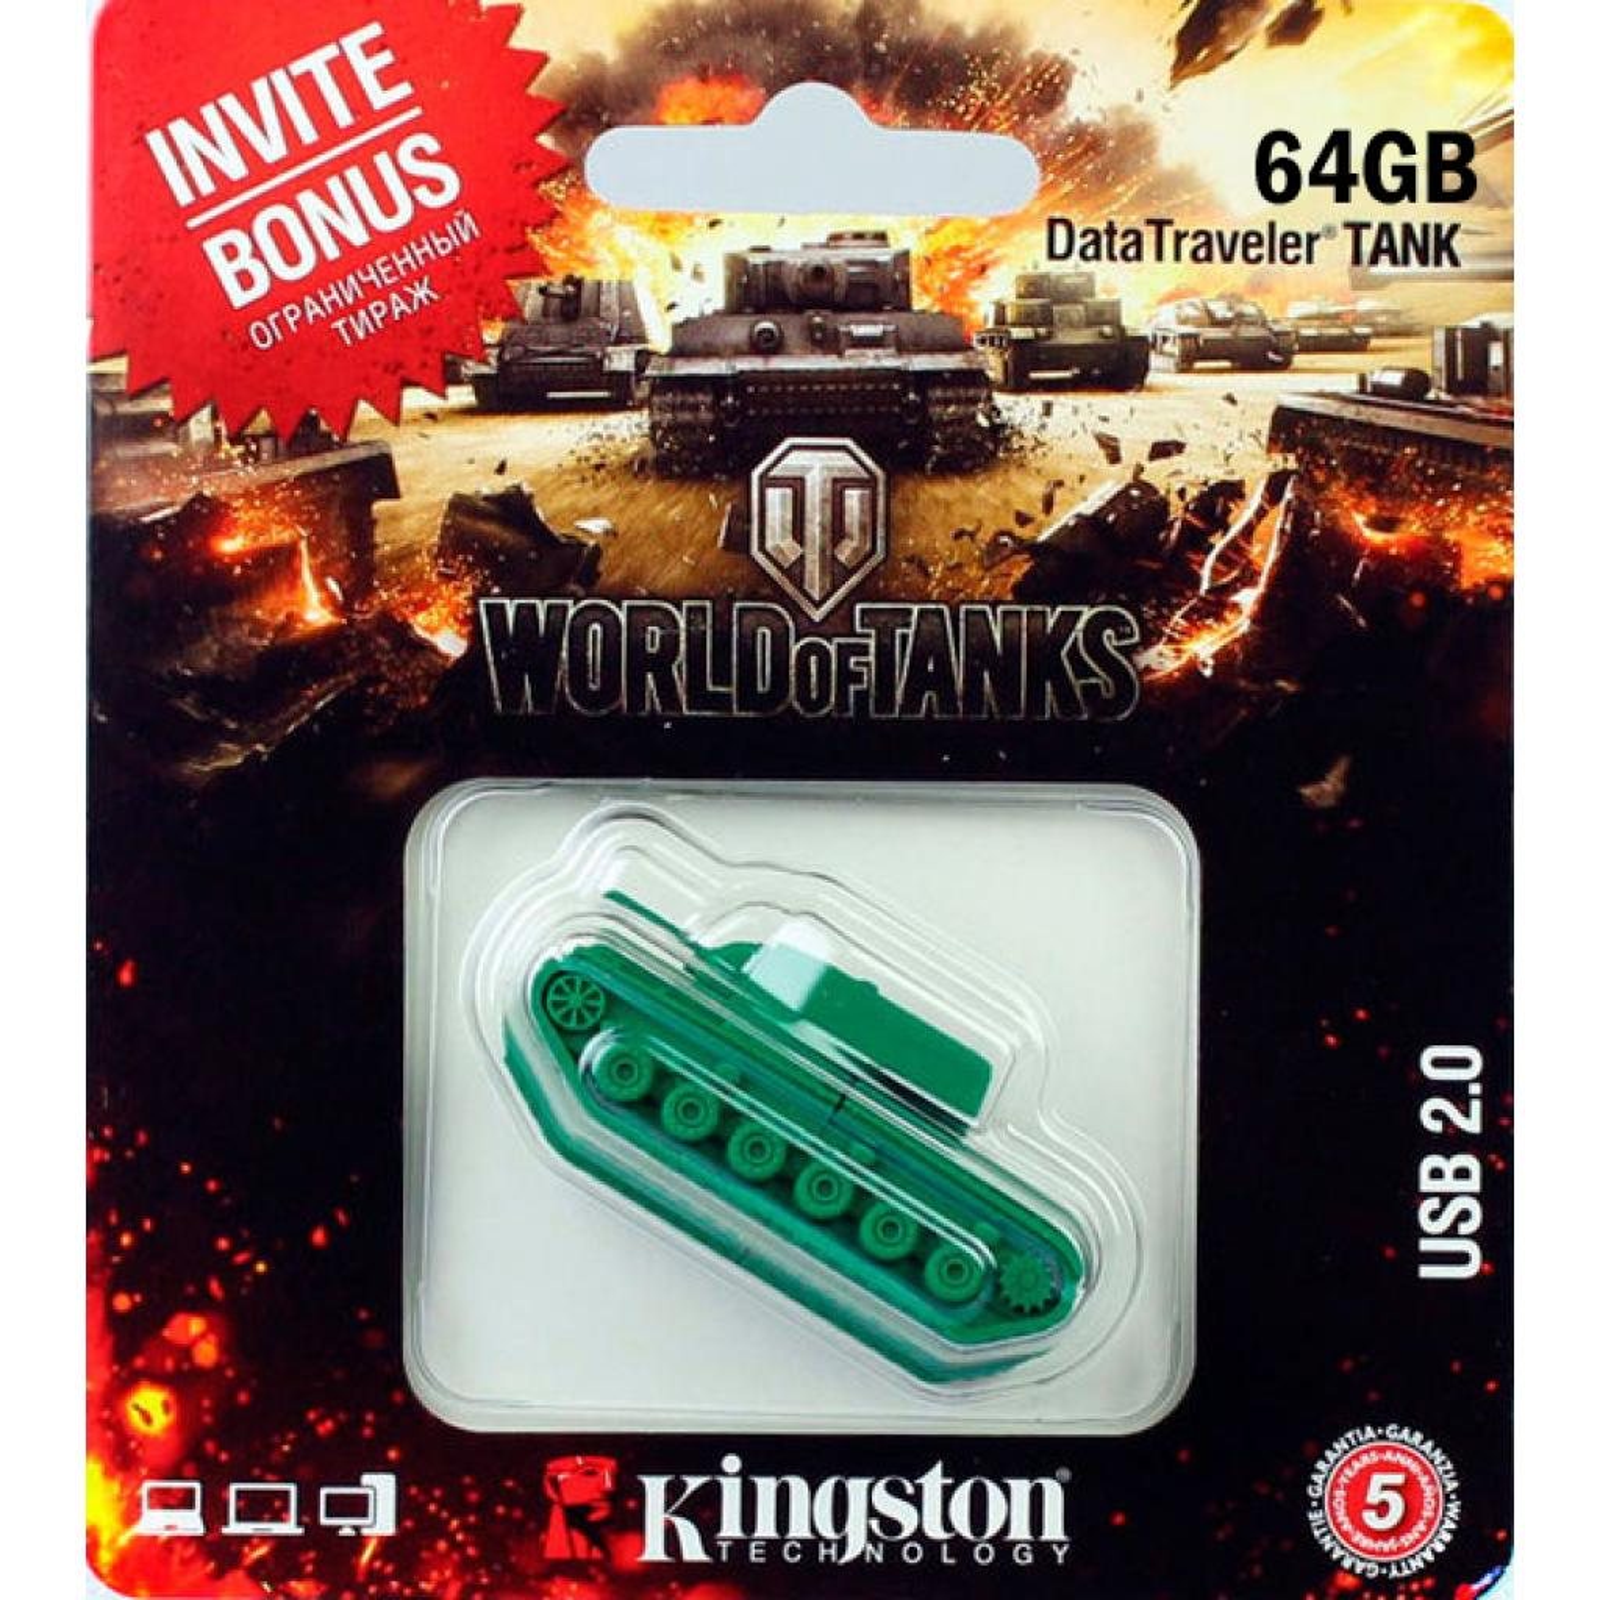 USB флеш накопитель Kingston 64 GB Custom Rubber Tank (DT-TANK/64GB)